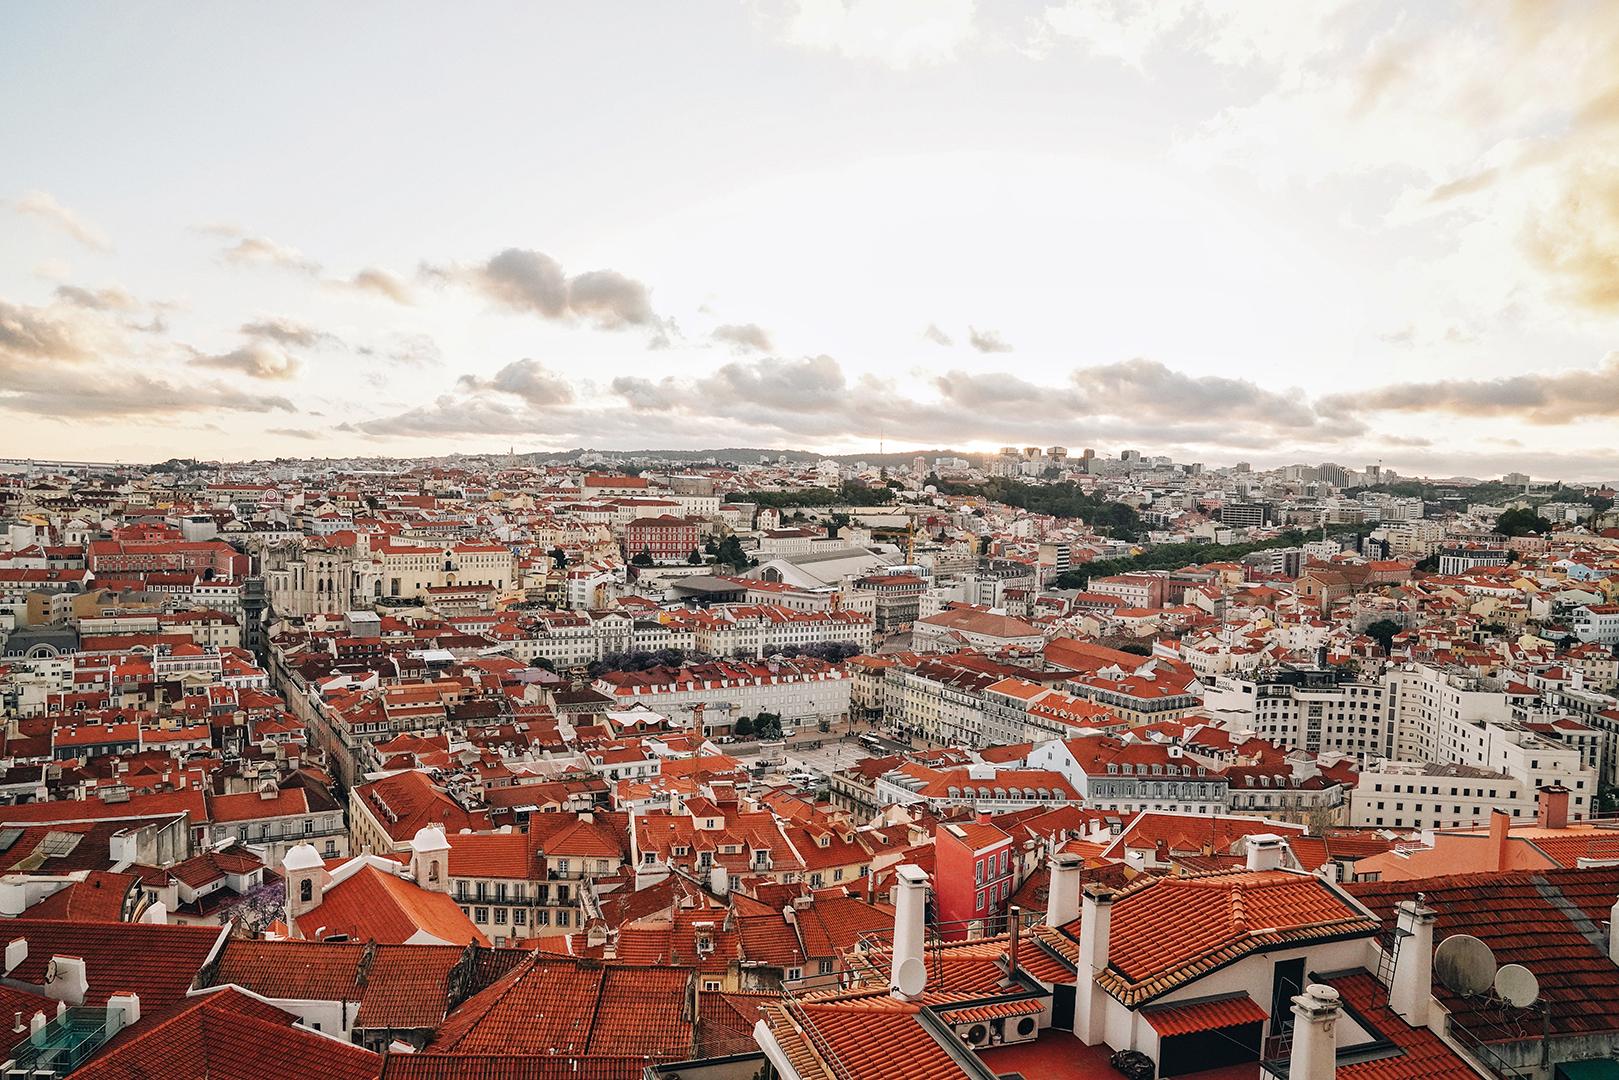 Sunset over this beautiful city, Lisbon